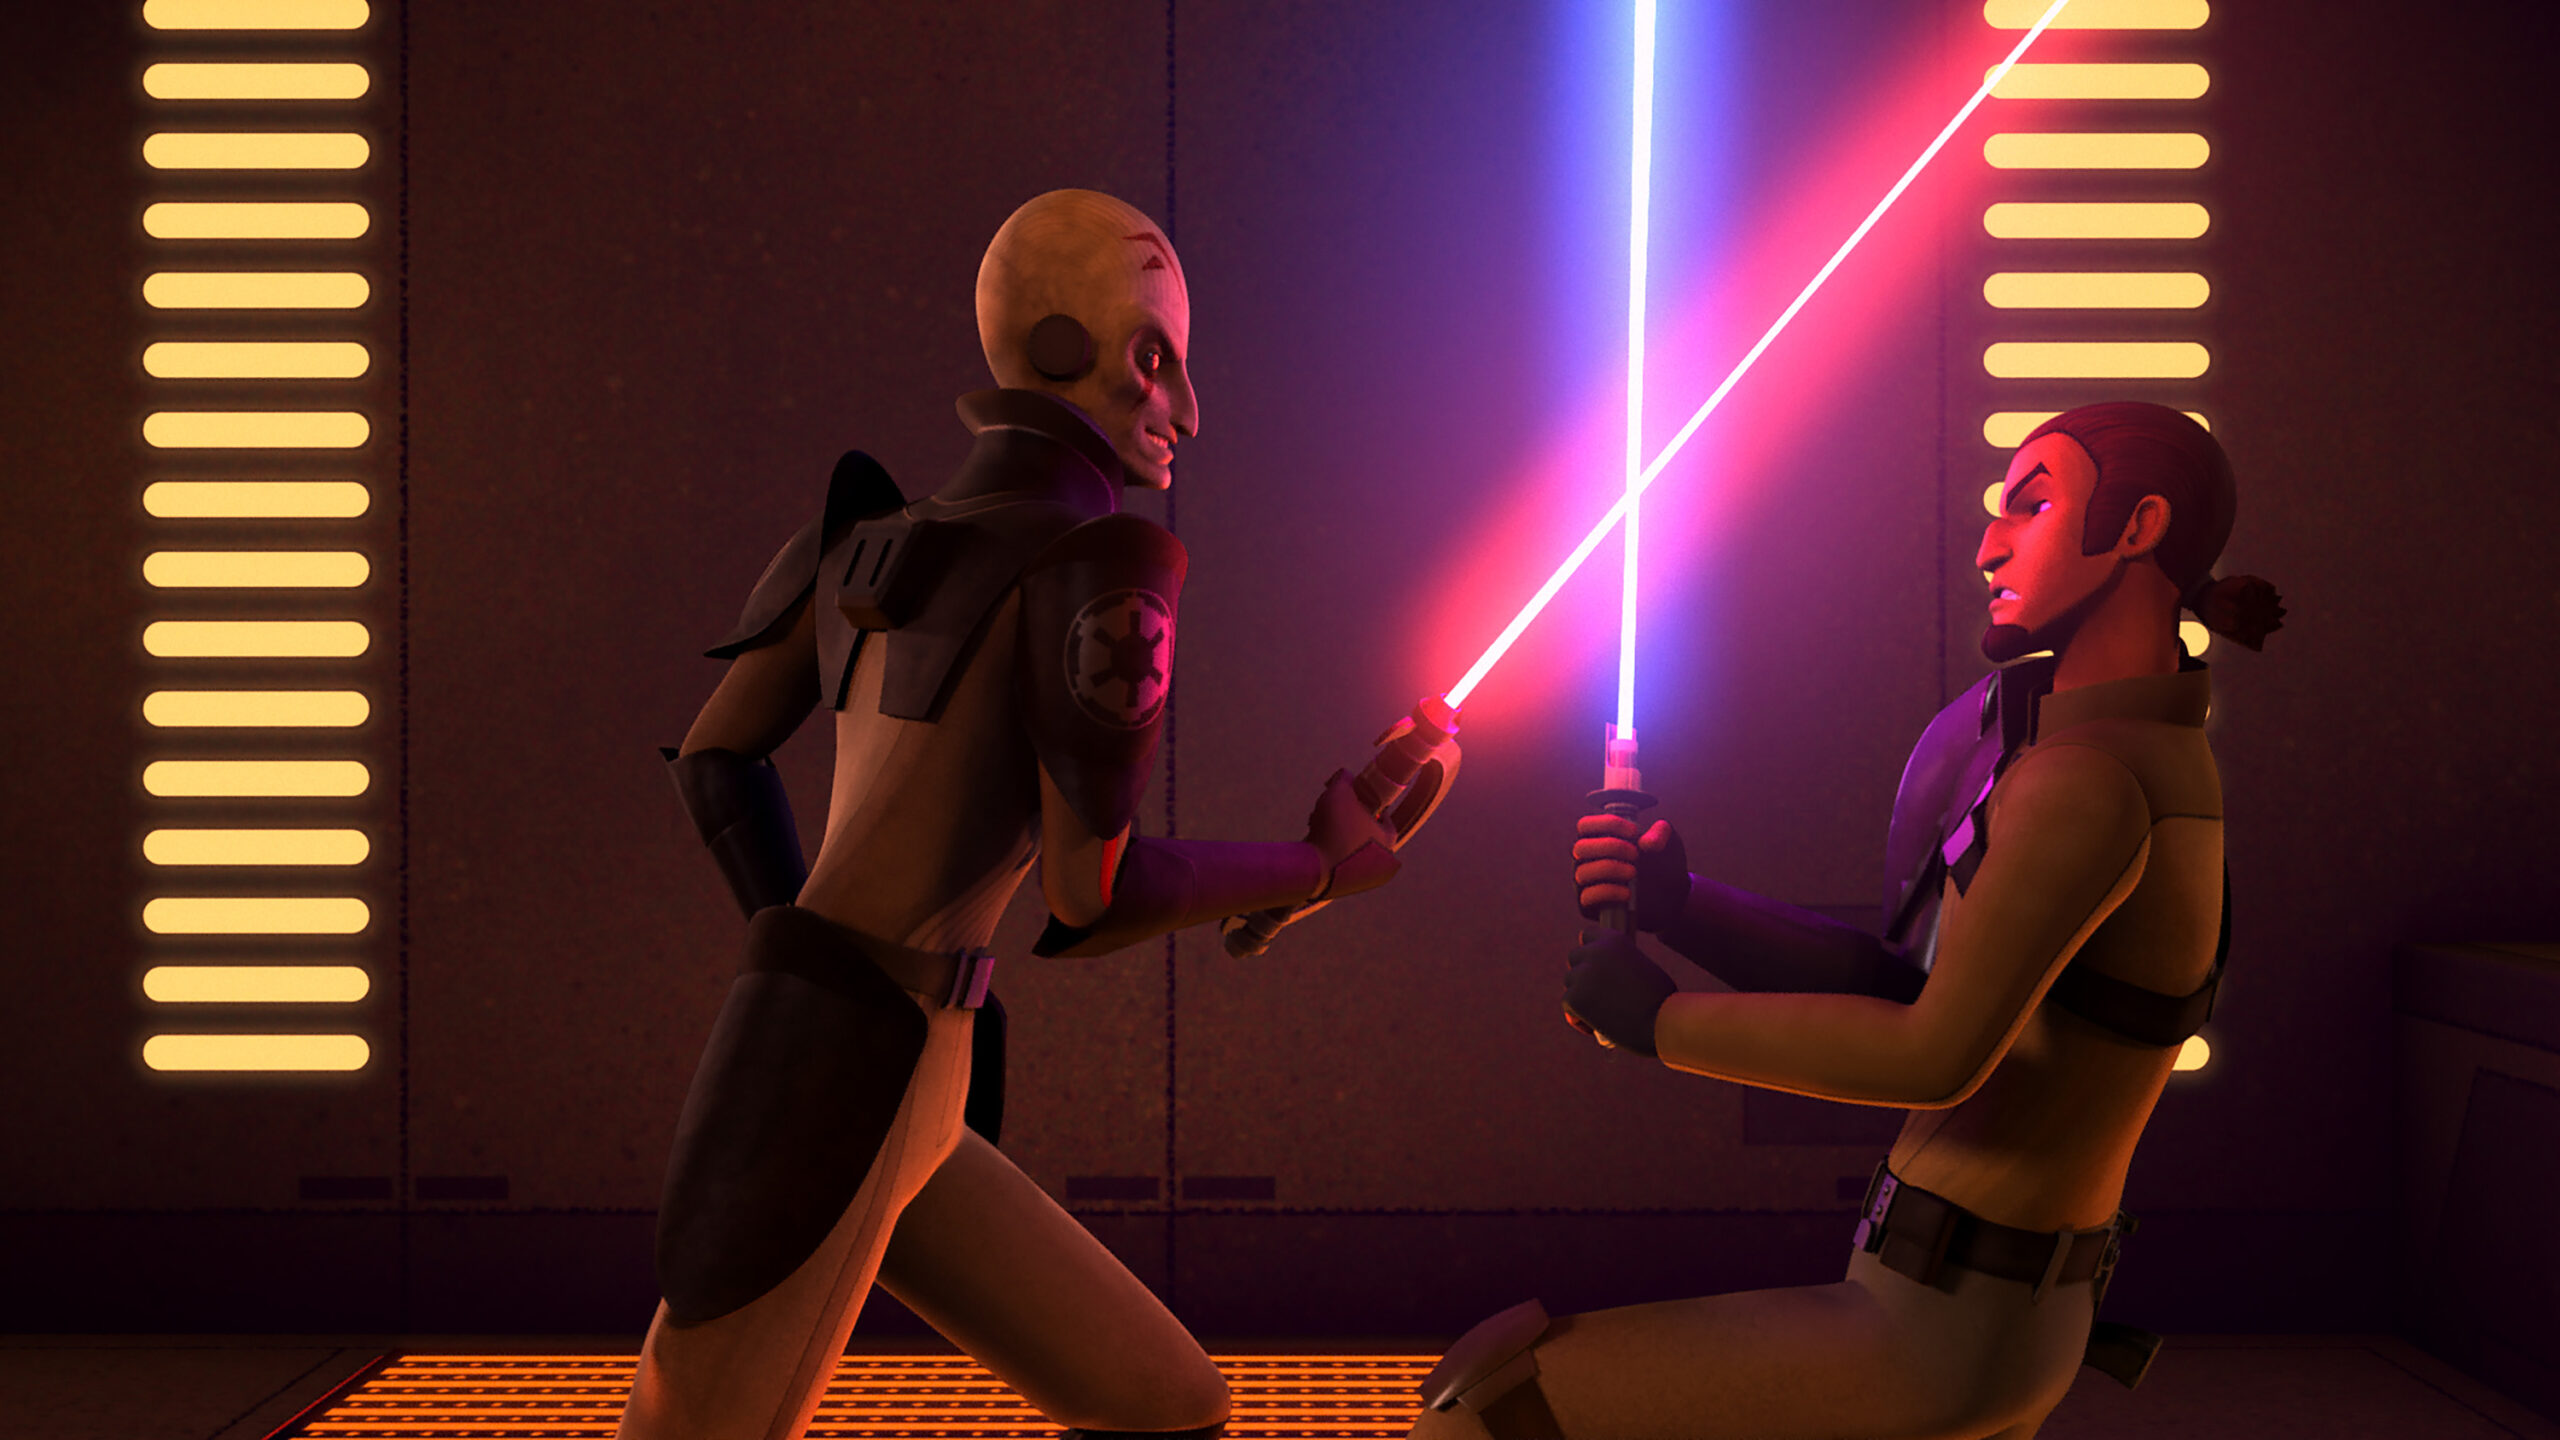 Star Wars: Rebelii Sezonul 1 Episodul 4 Online Subtitrat